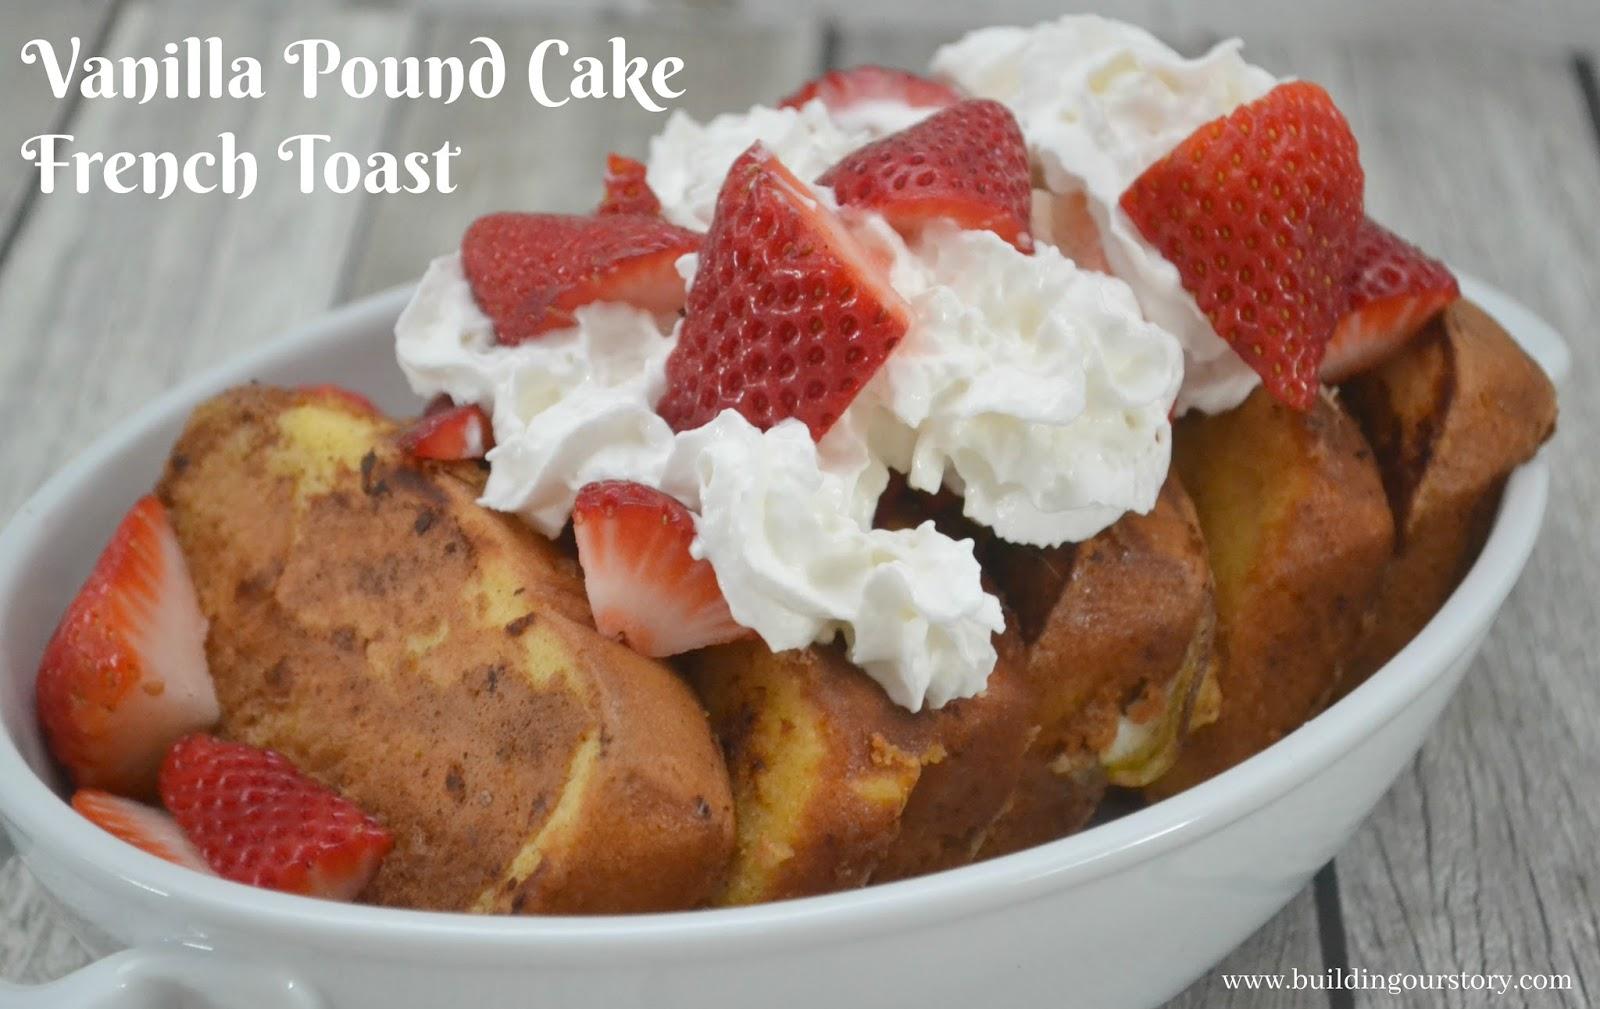 Vanilla Pound Cake French Toast